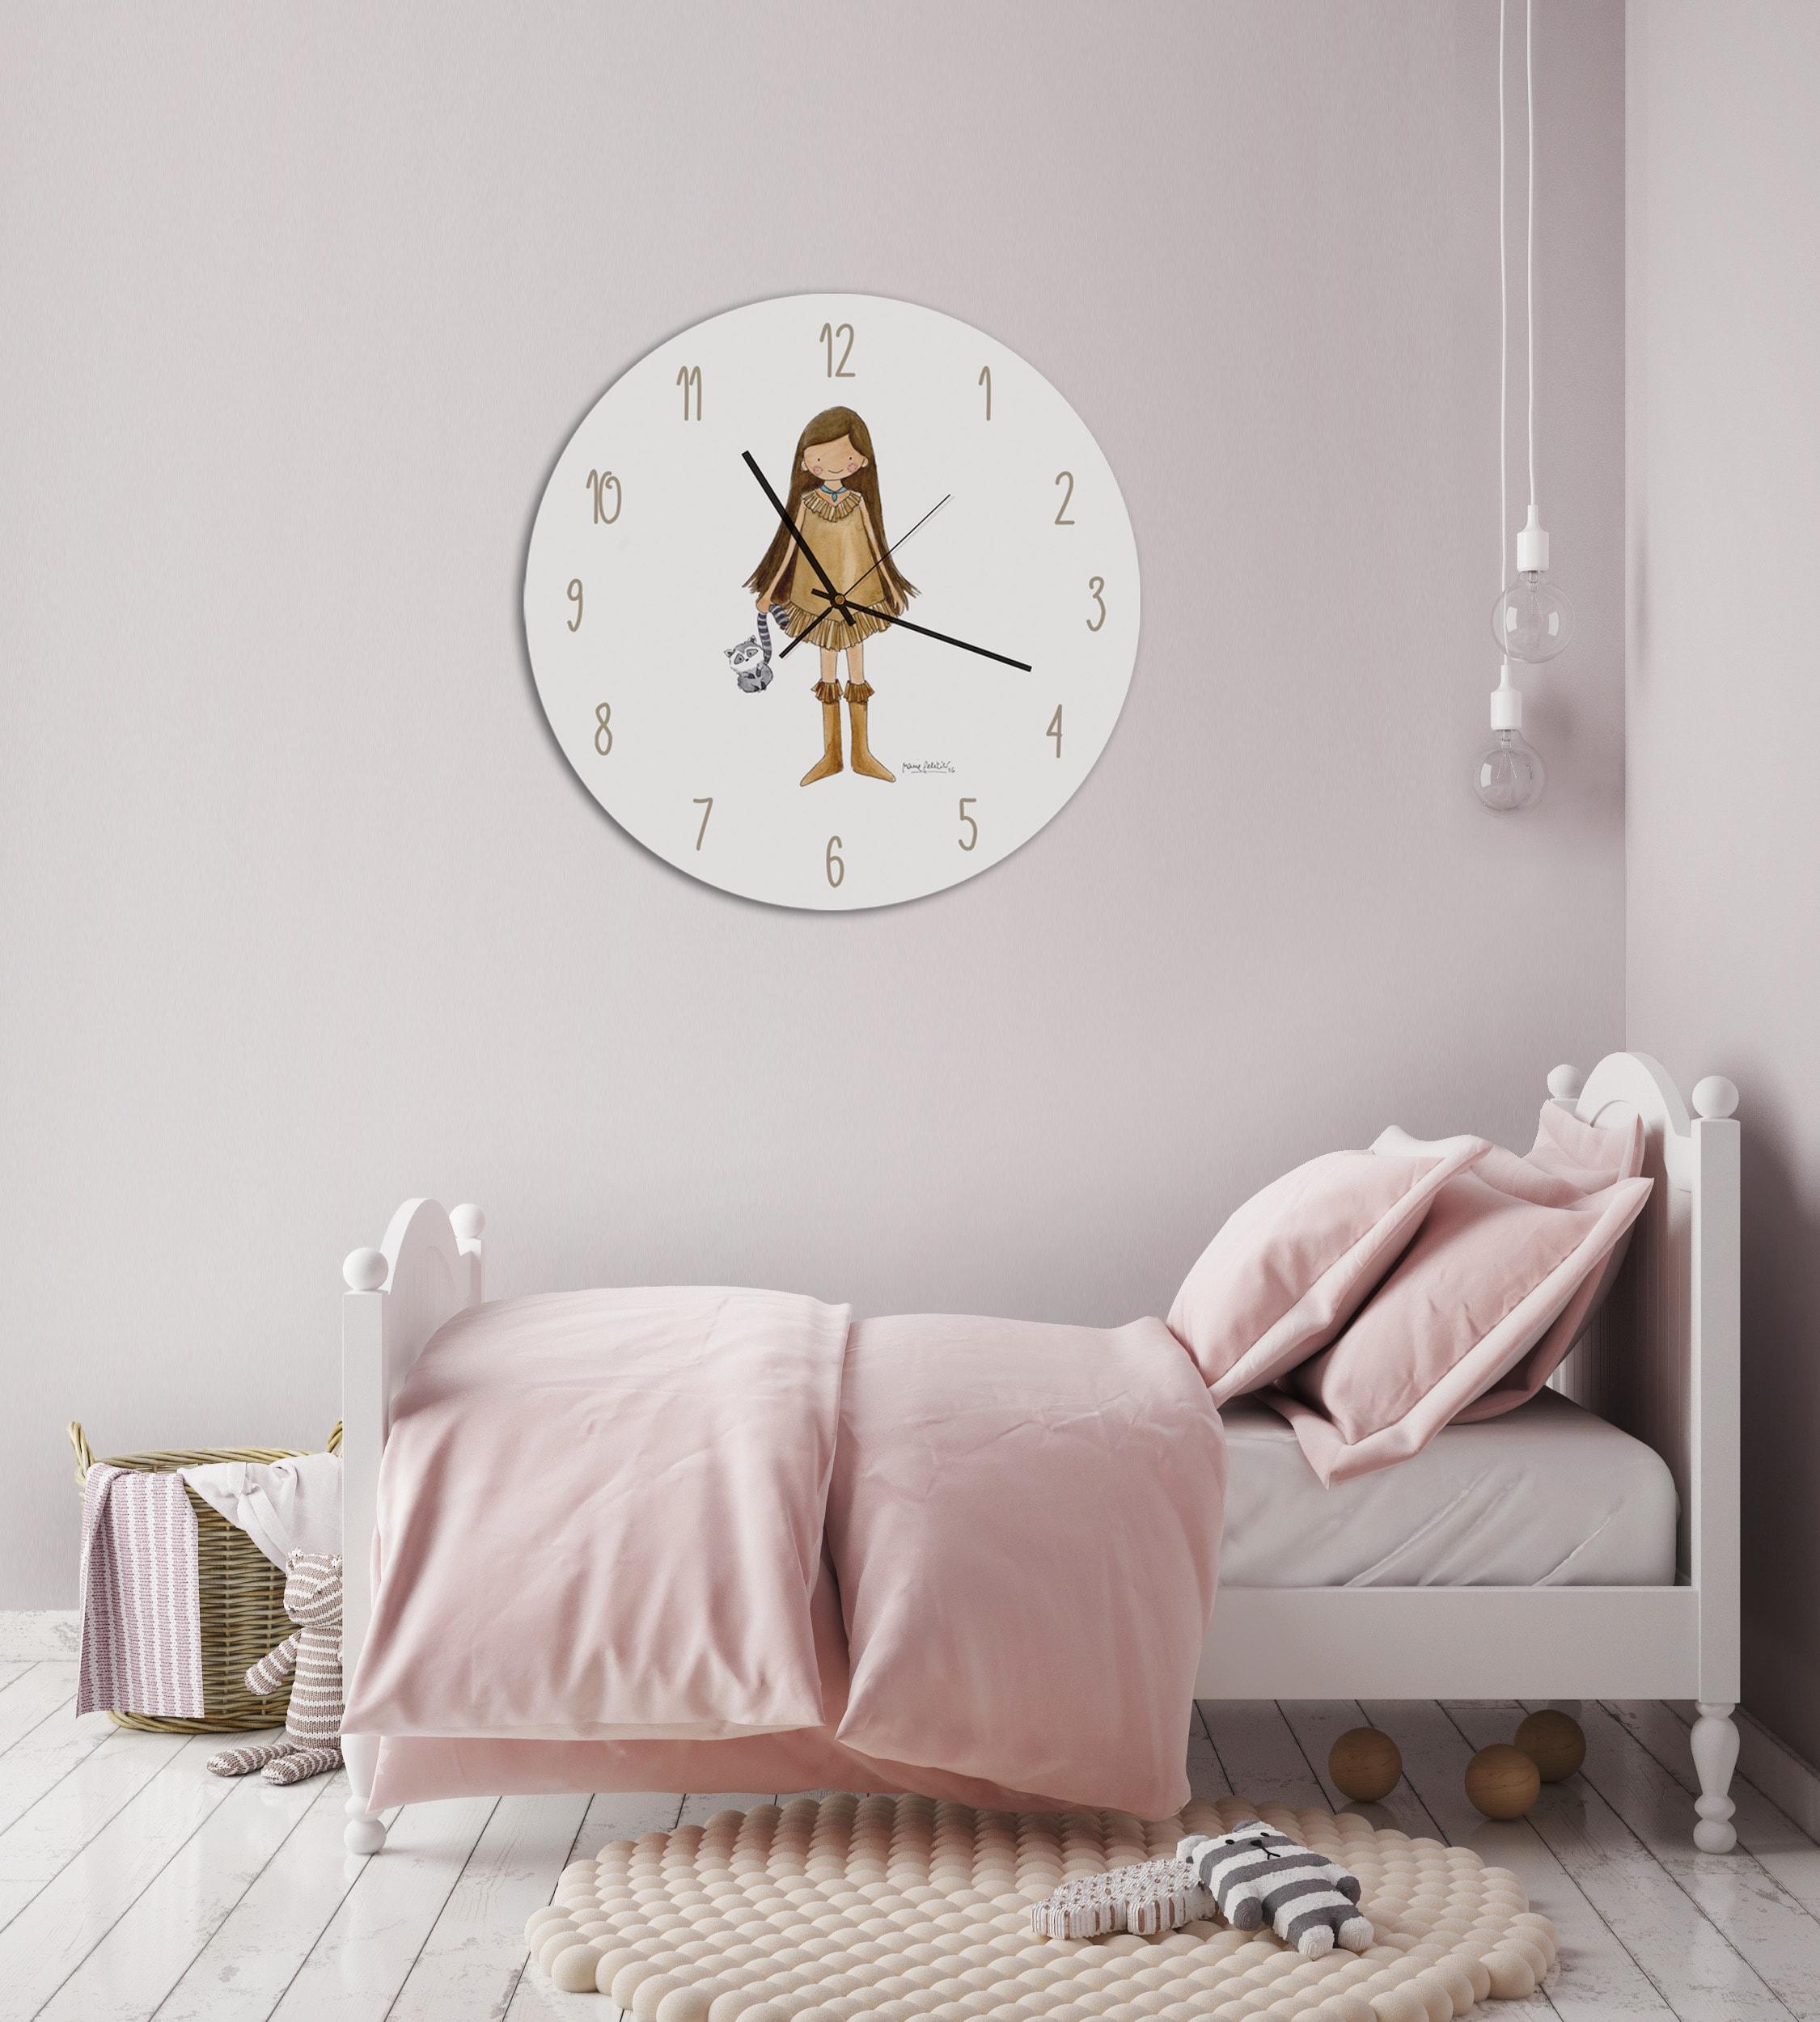 AMB SH RELOJ min - Reloj Princesas Frozen